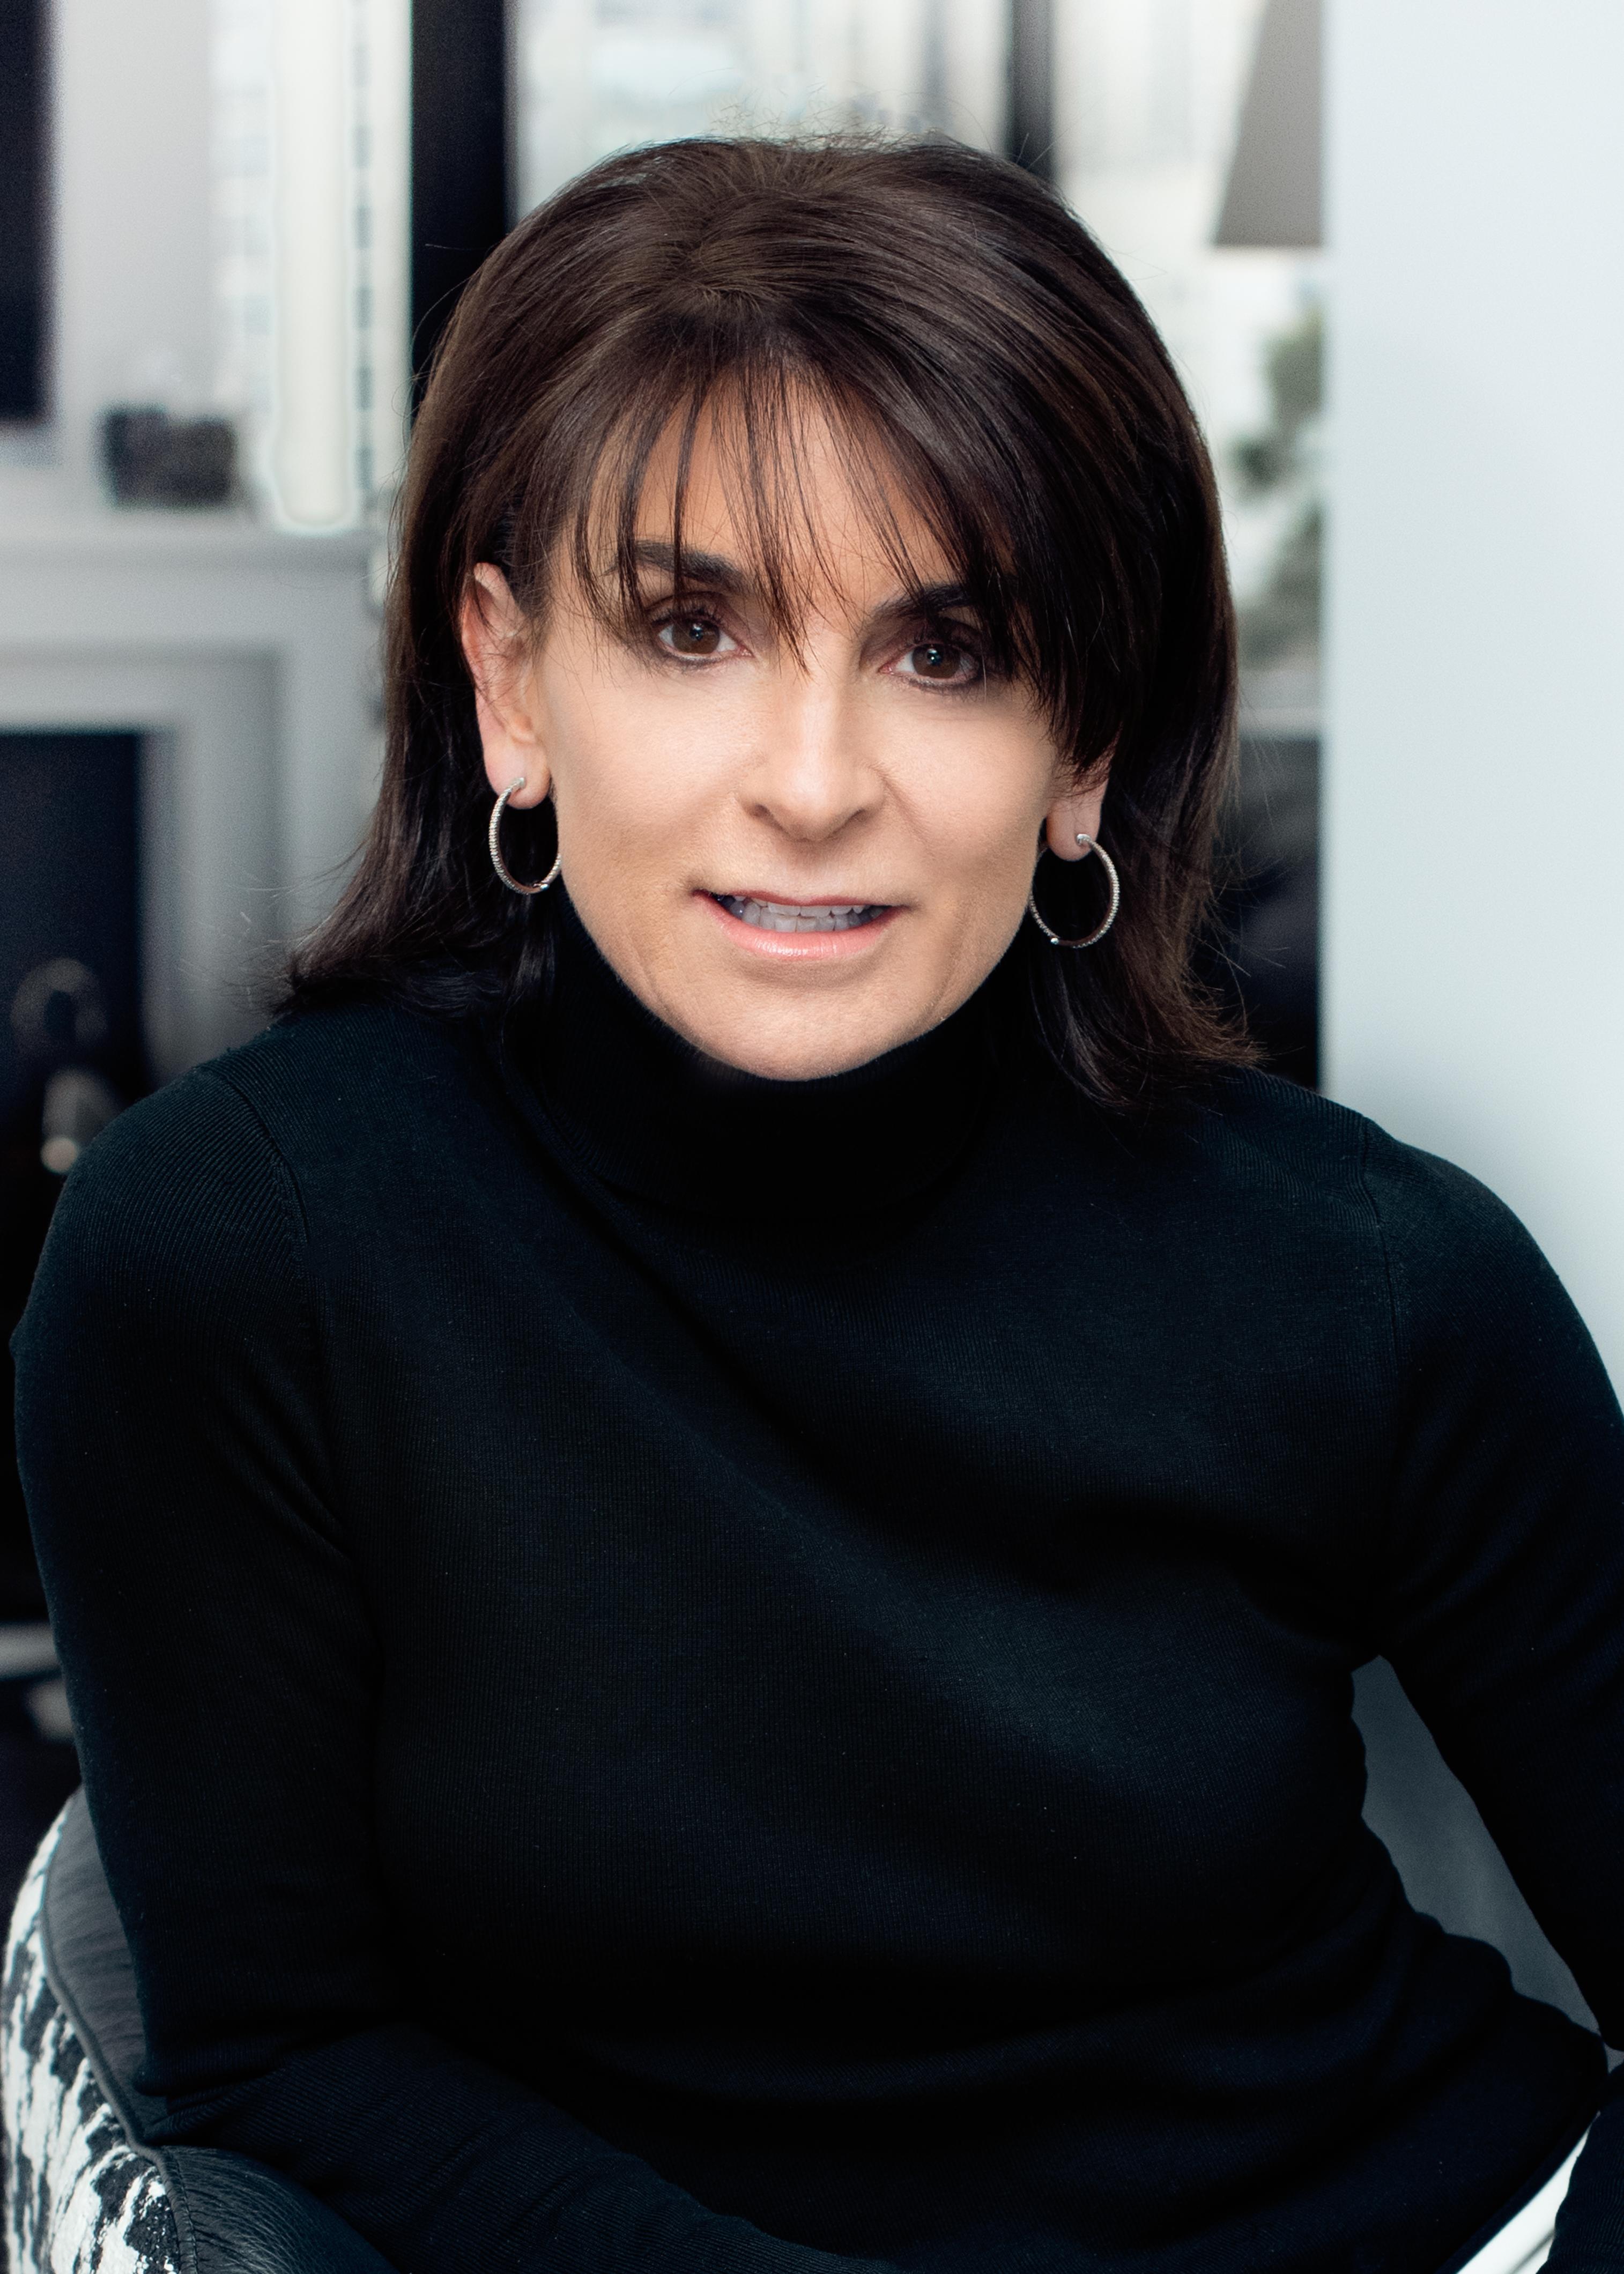 Pam Rueve